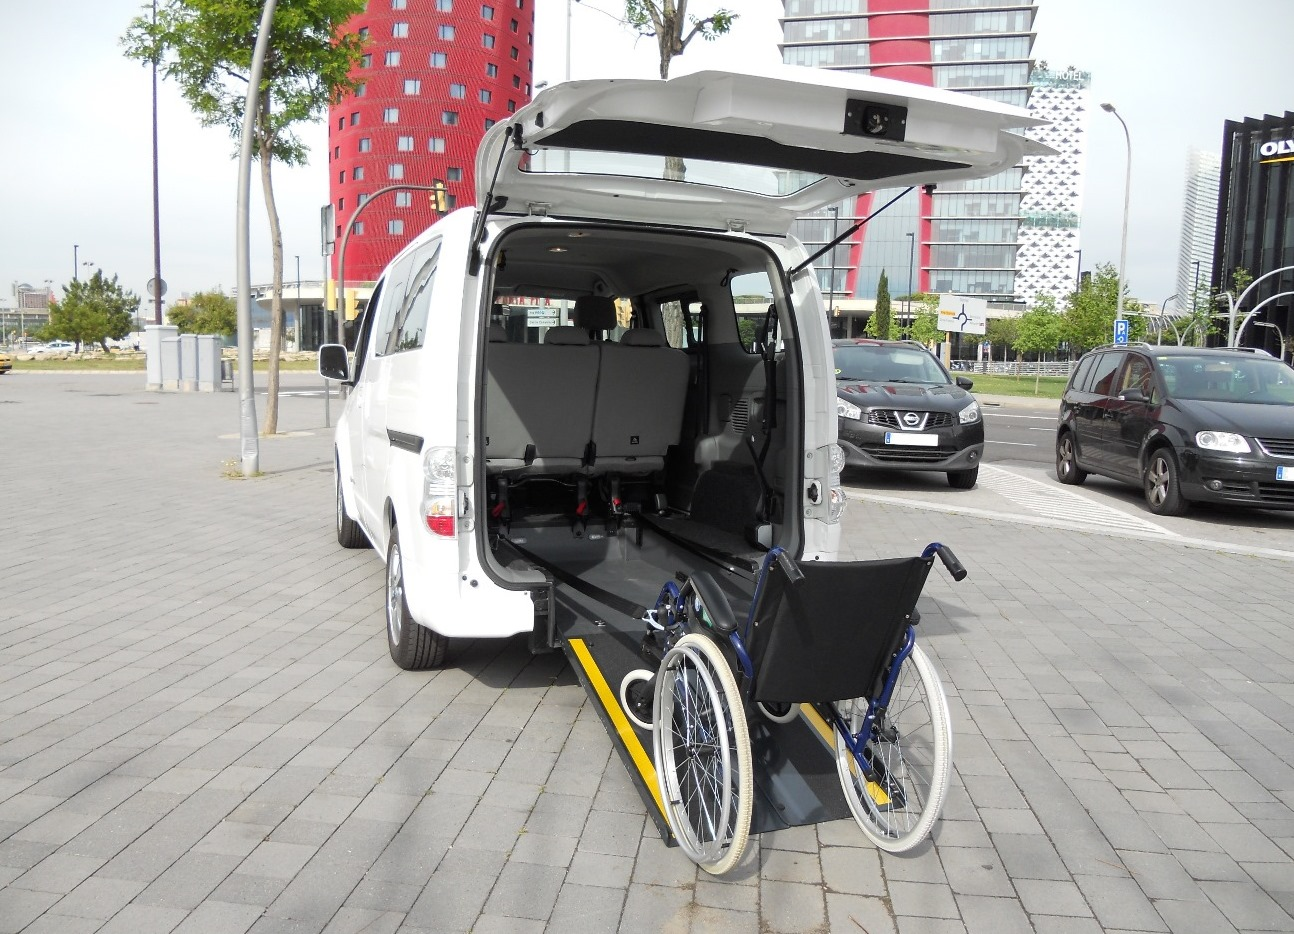 PORTADA NEGOCIO coche electrico adaptado